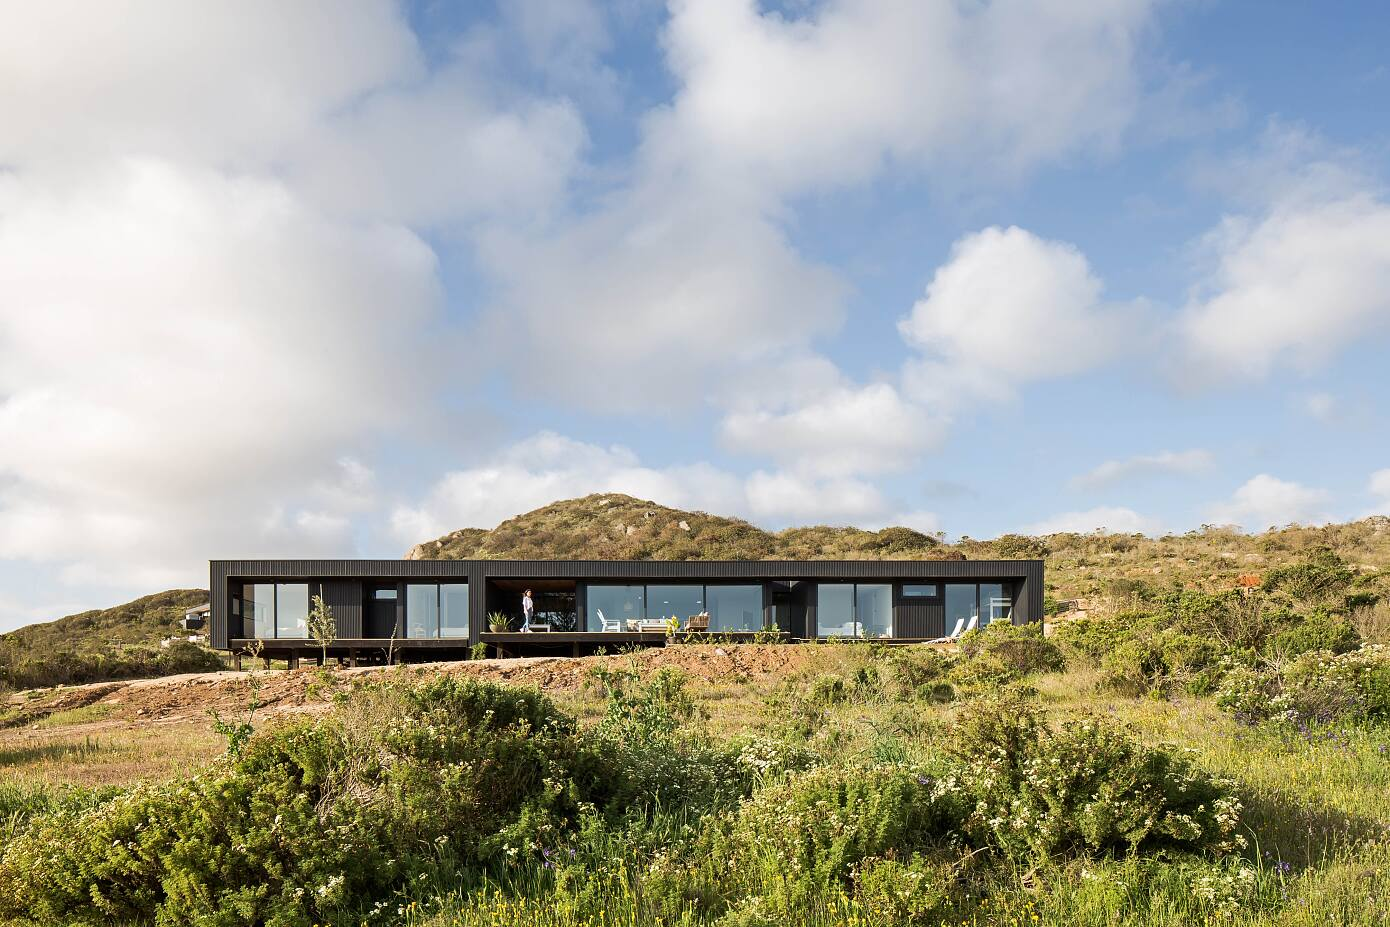 Casa WV by Cristián Romero Valente